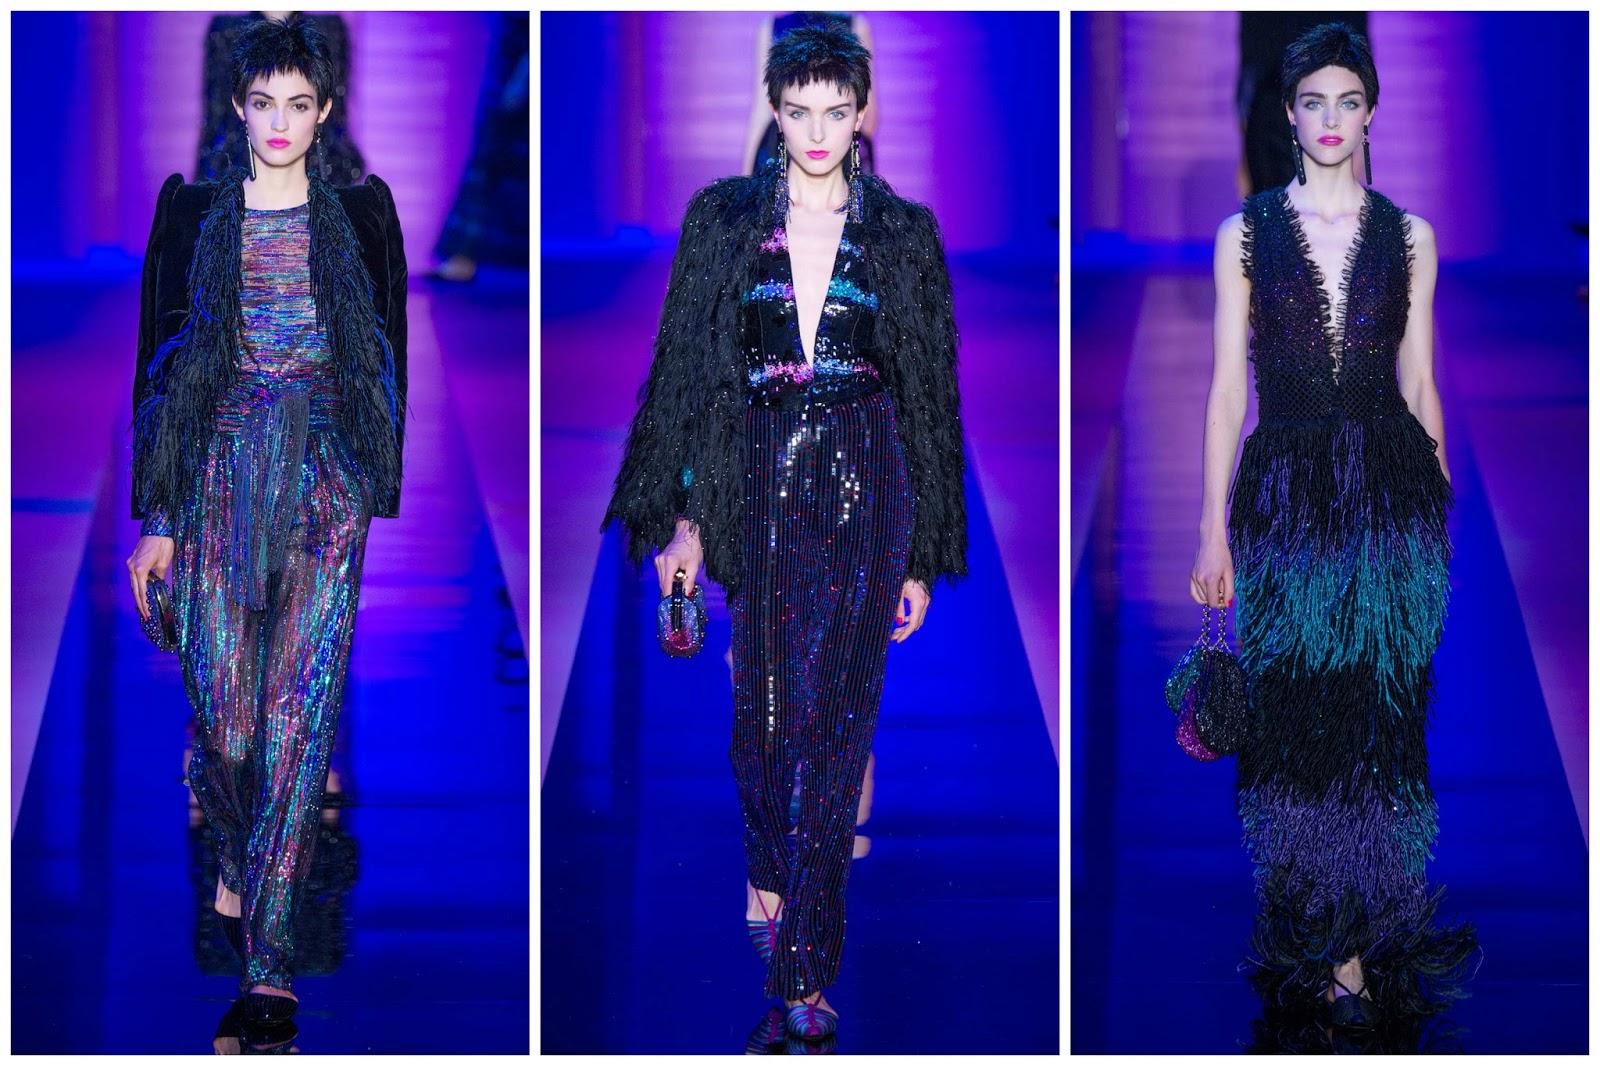 Armani Fashion Show 2015